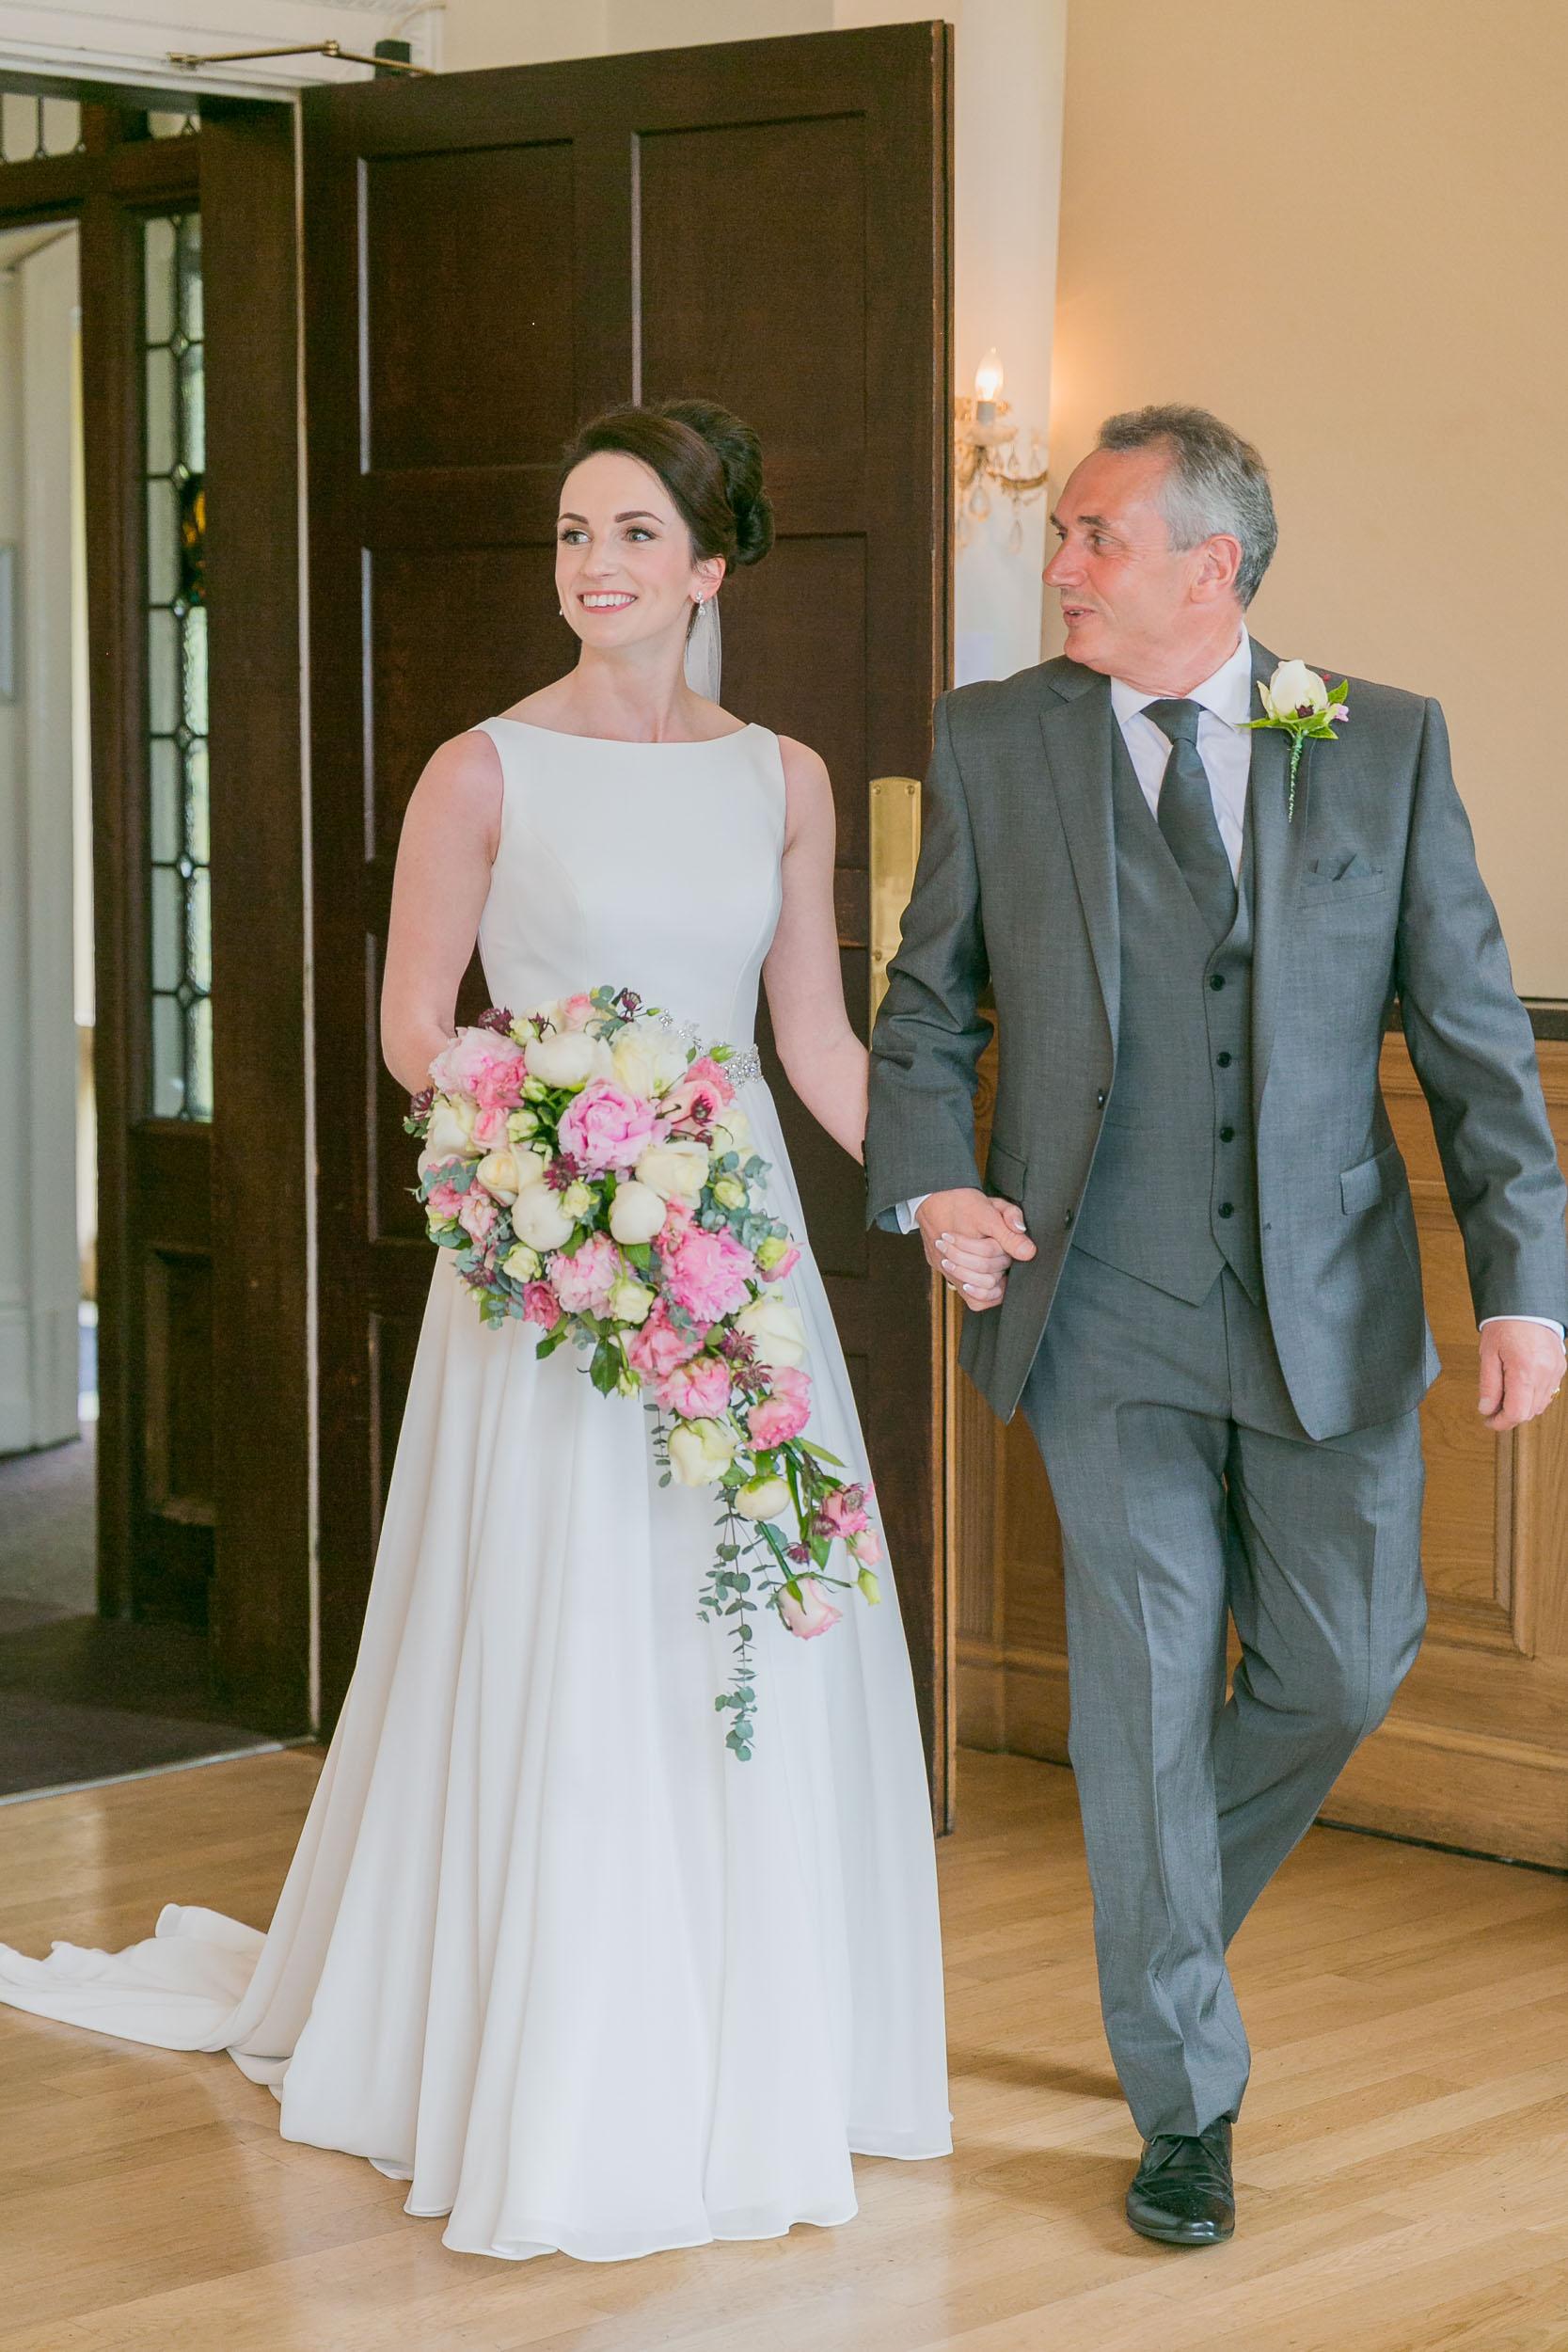 April & Chris-Wedding-West Tower-photo-0174.jpg